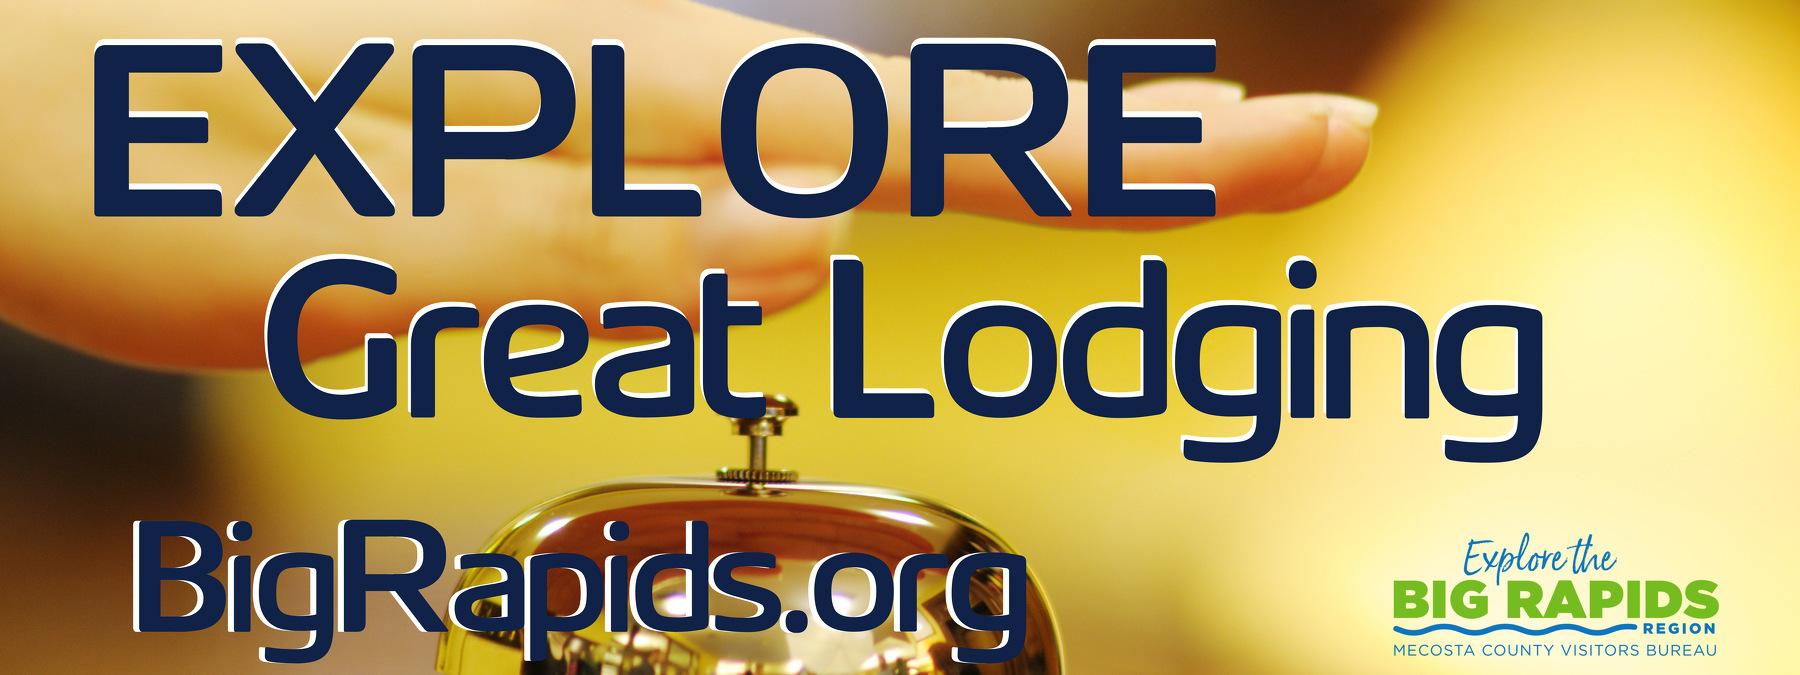 lodging-sign-(2).jpg